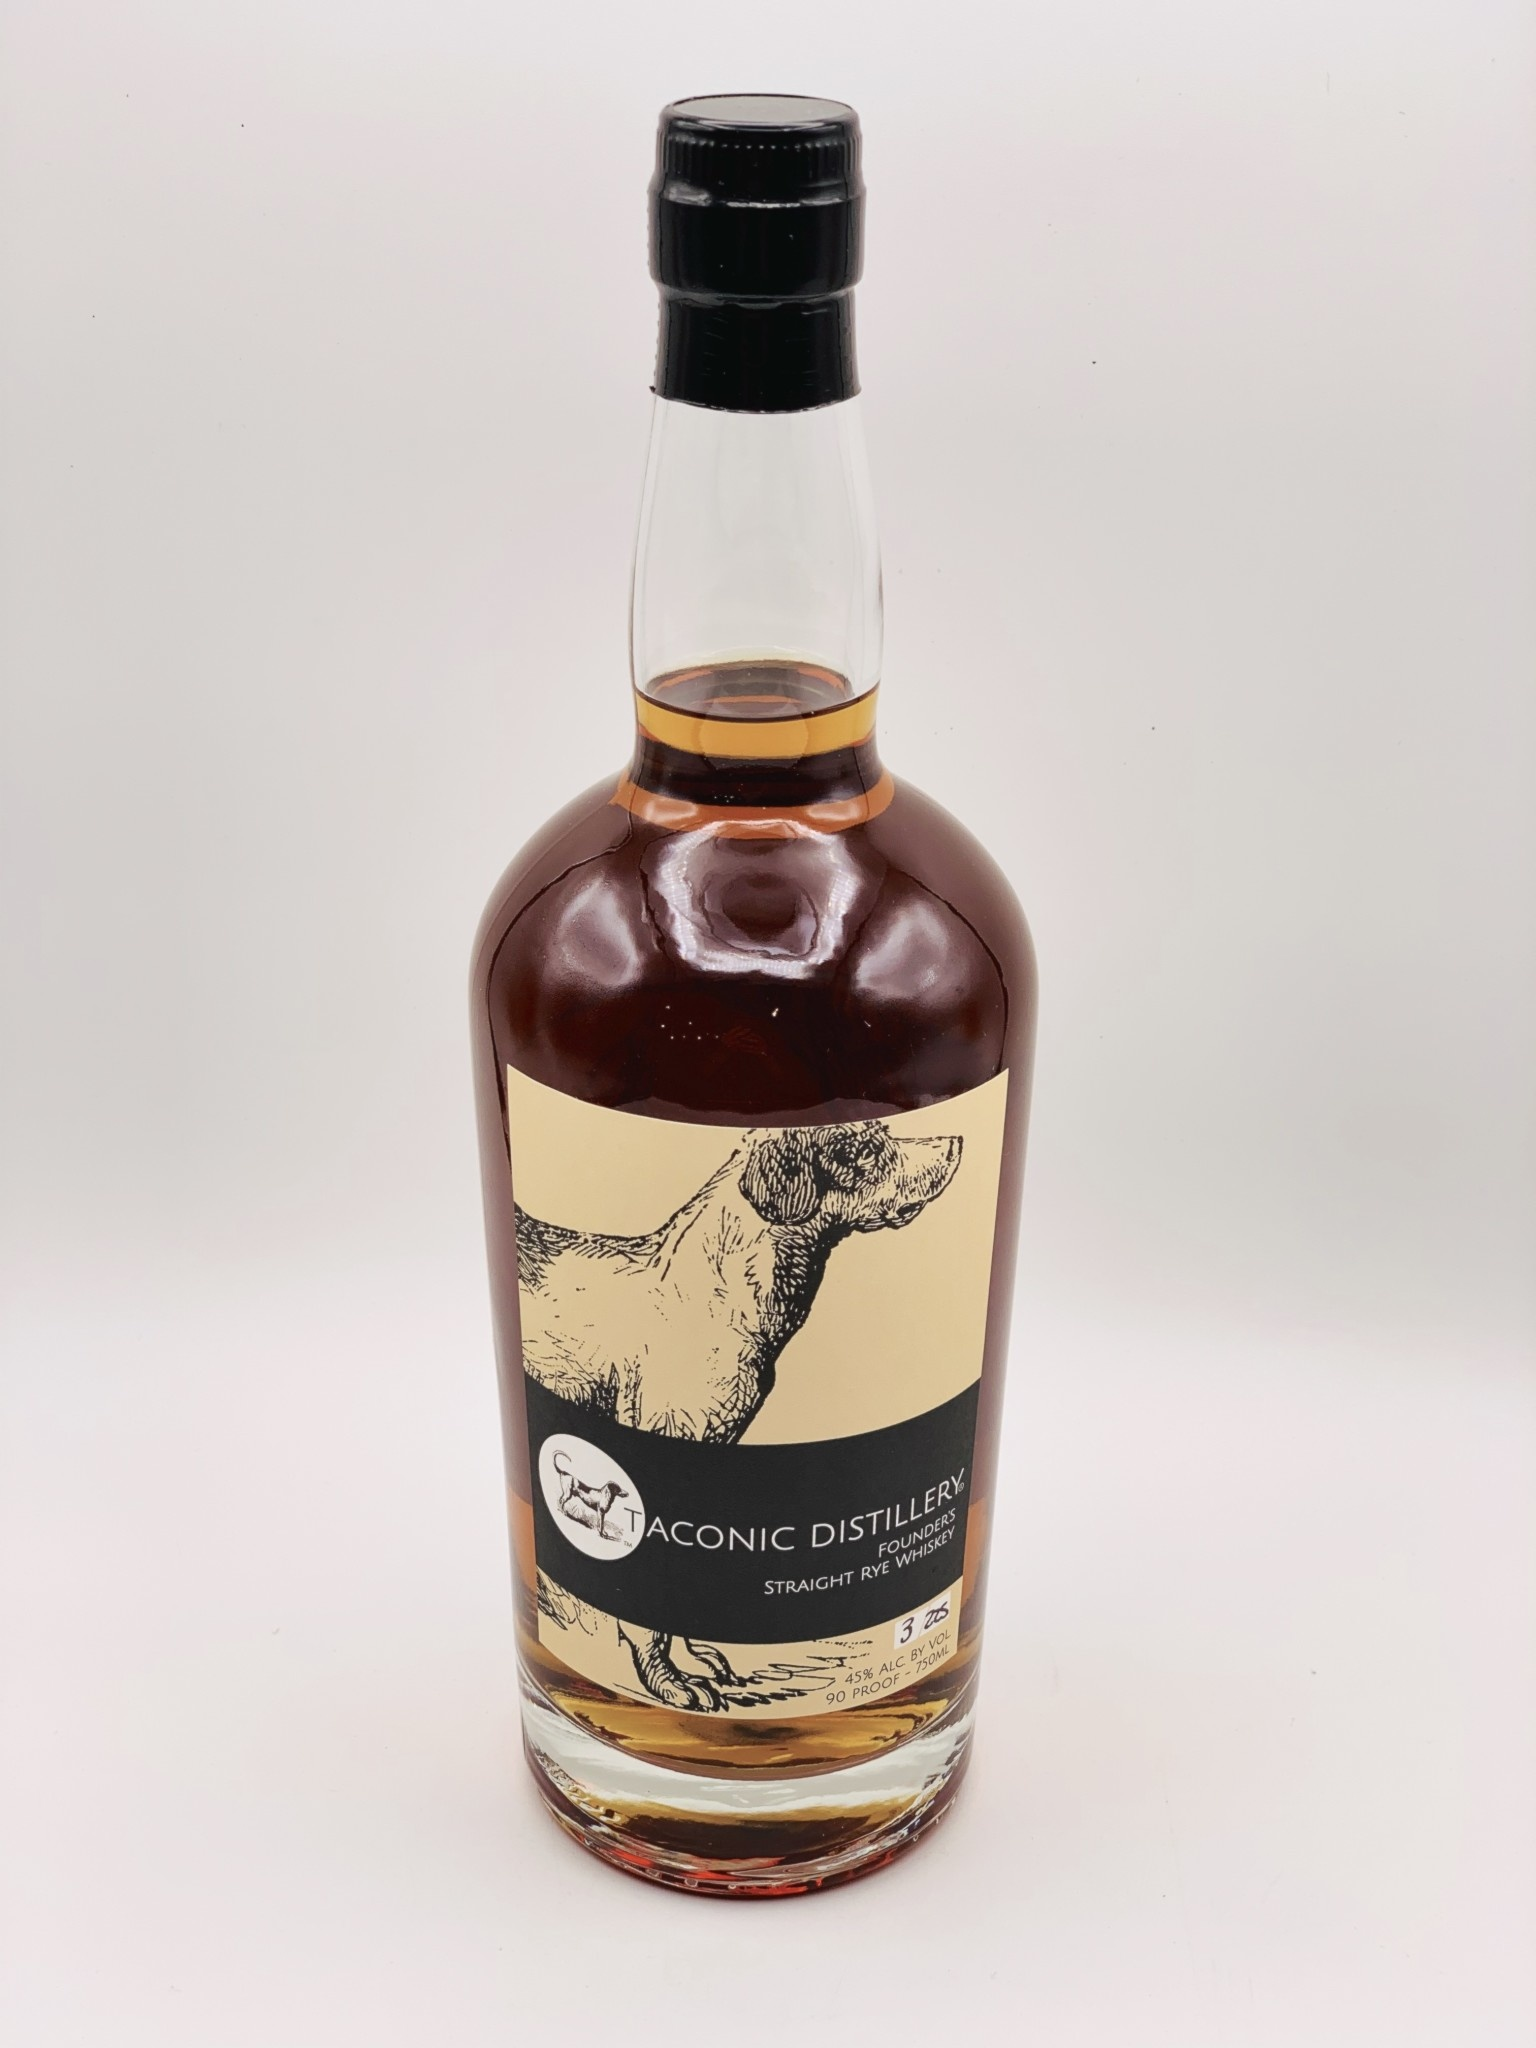 Taconic Distillery Straight Rye Whiskey  (90 proof) 750ml